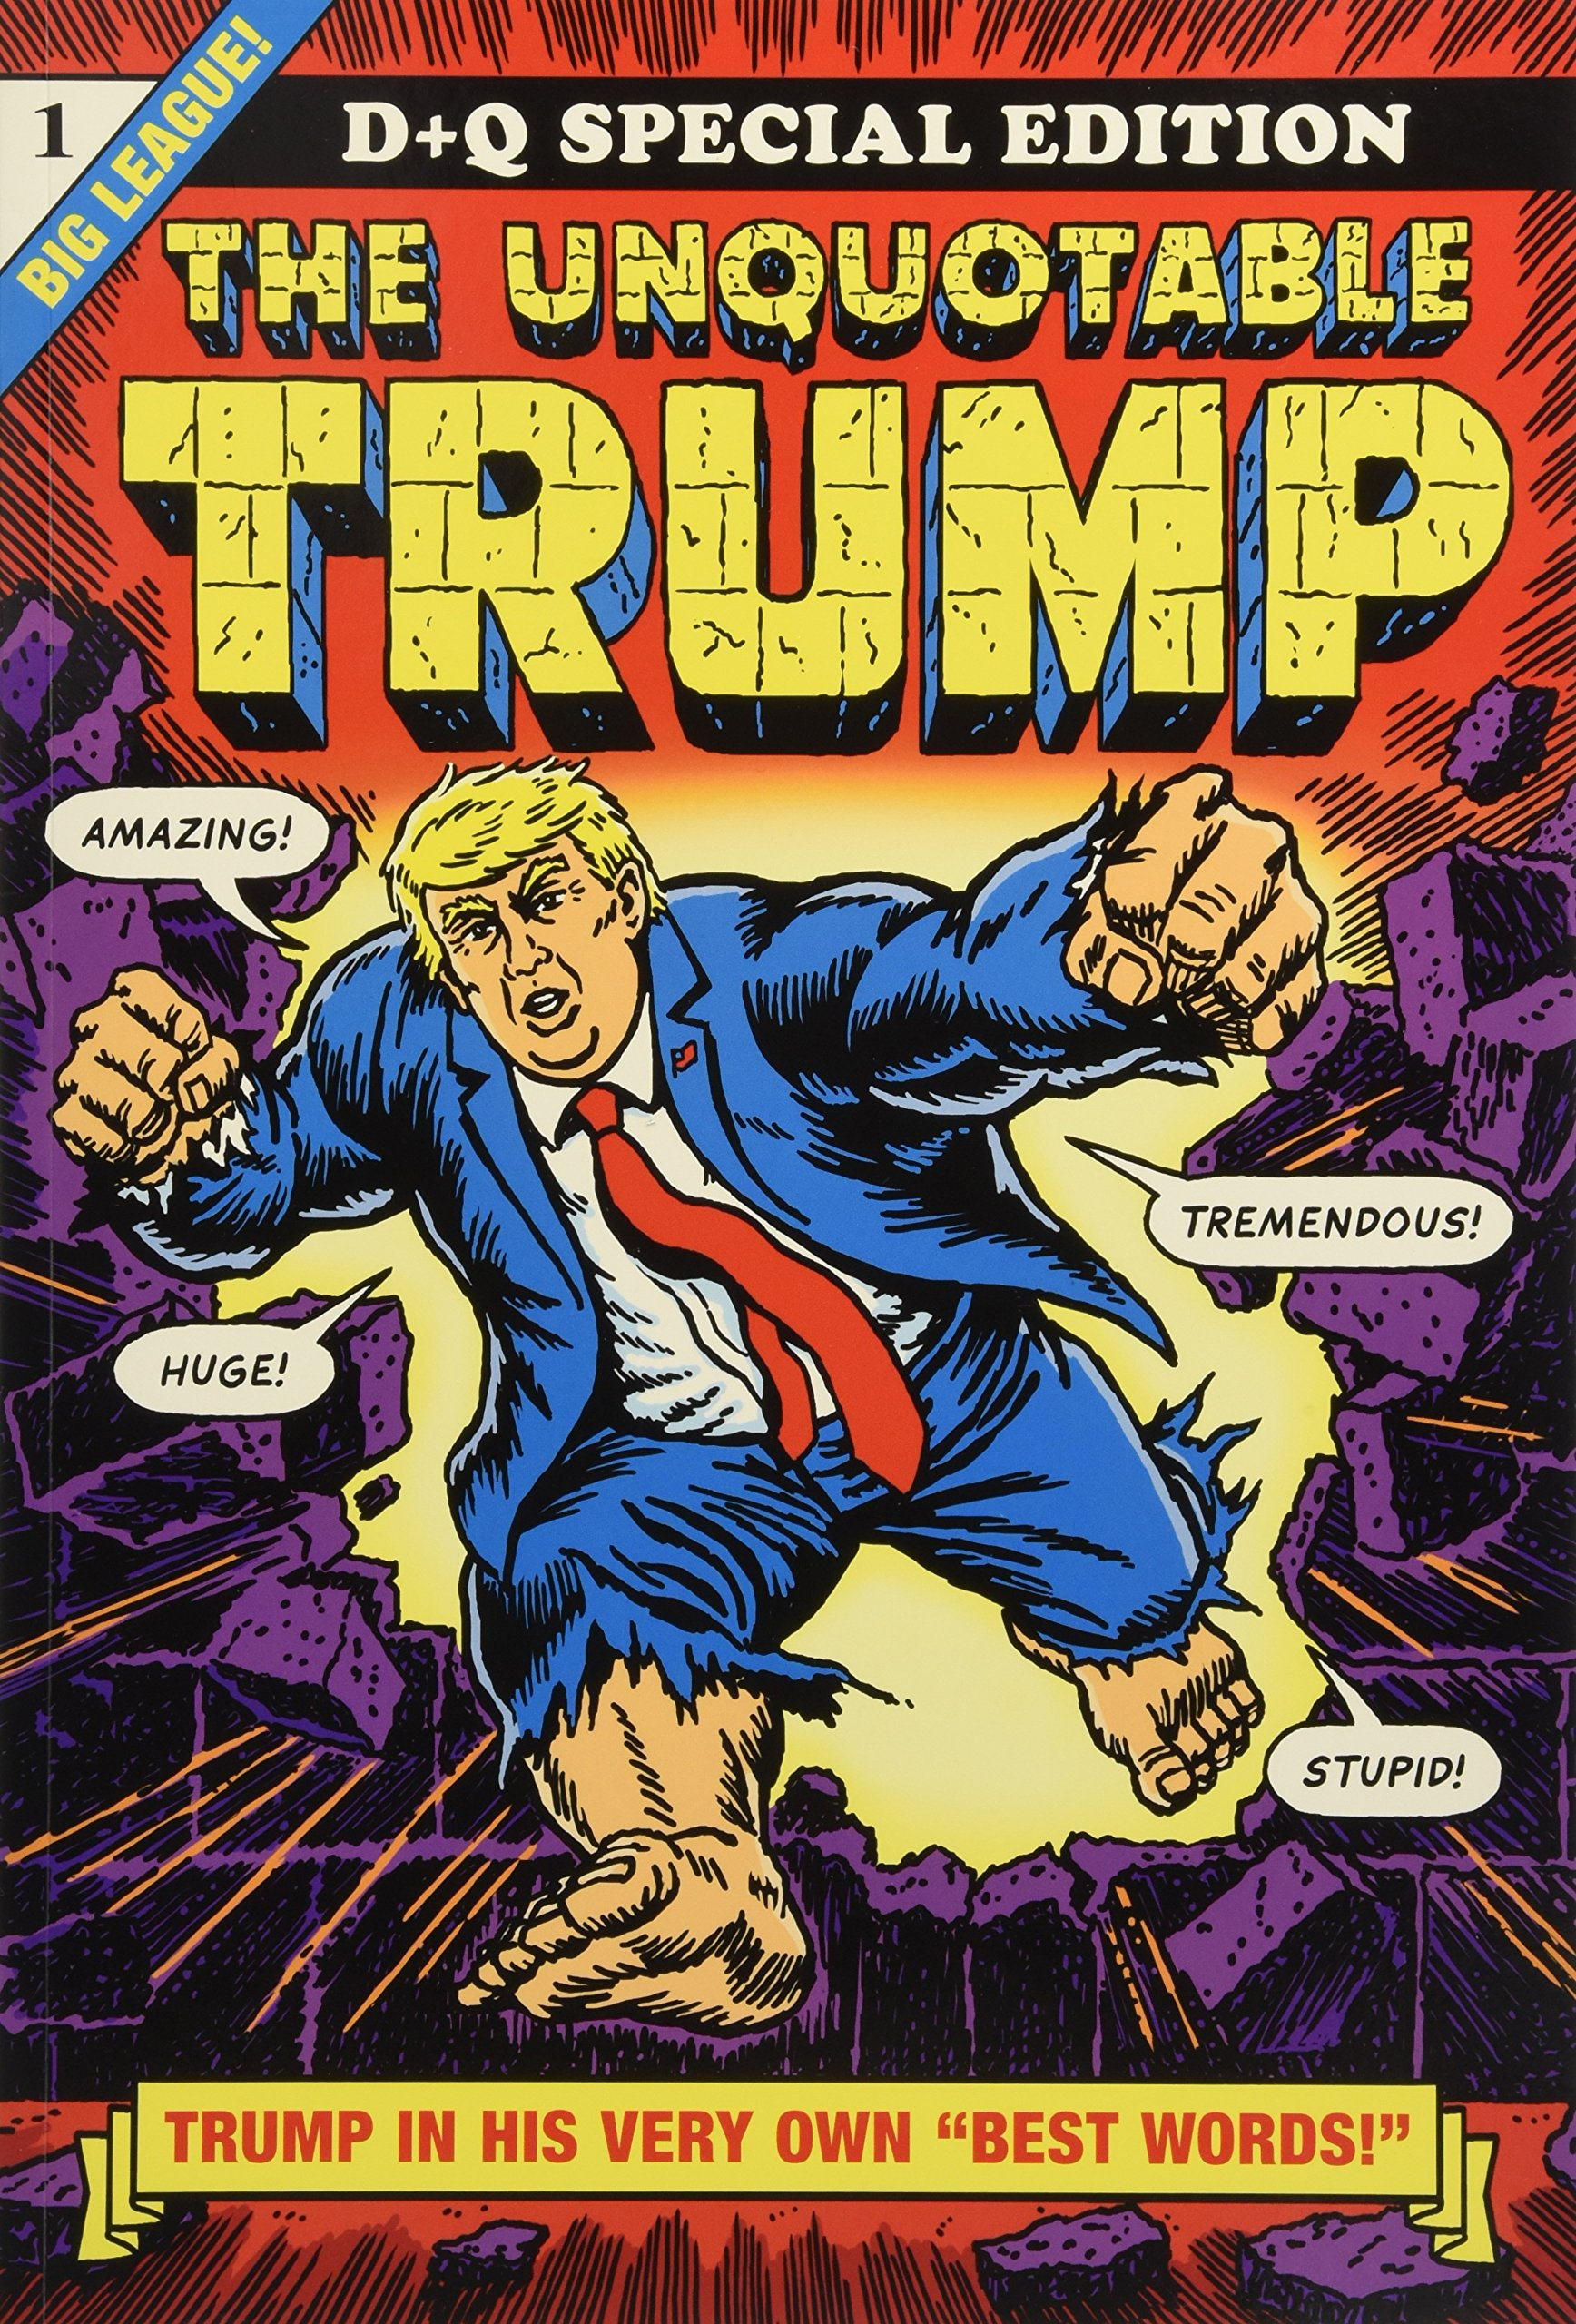 The Unquotable Trump: Amazon.de: Sikoryak, R.: Fremdsprachige Bücher